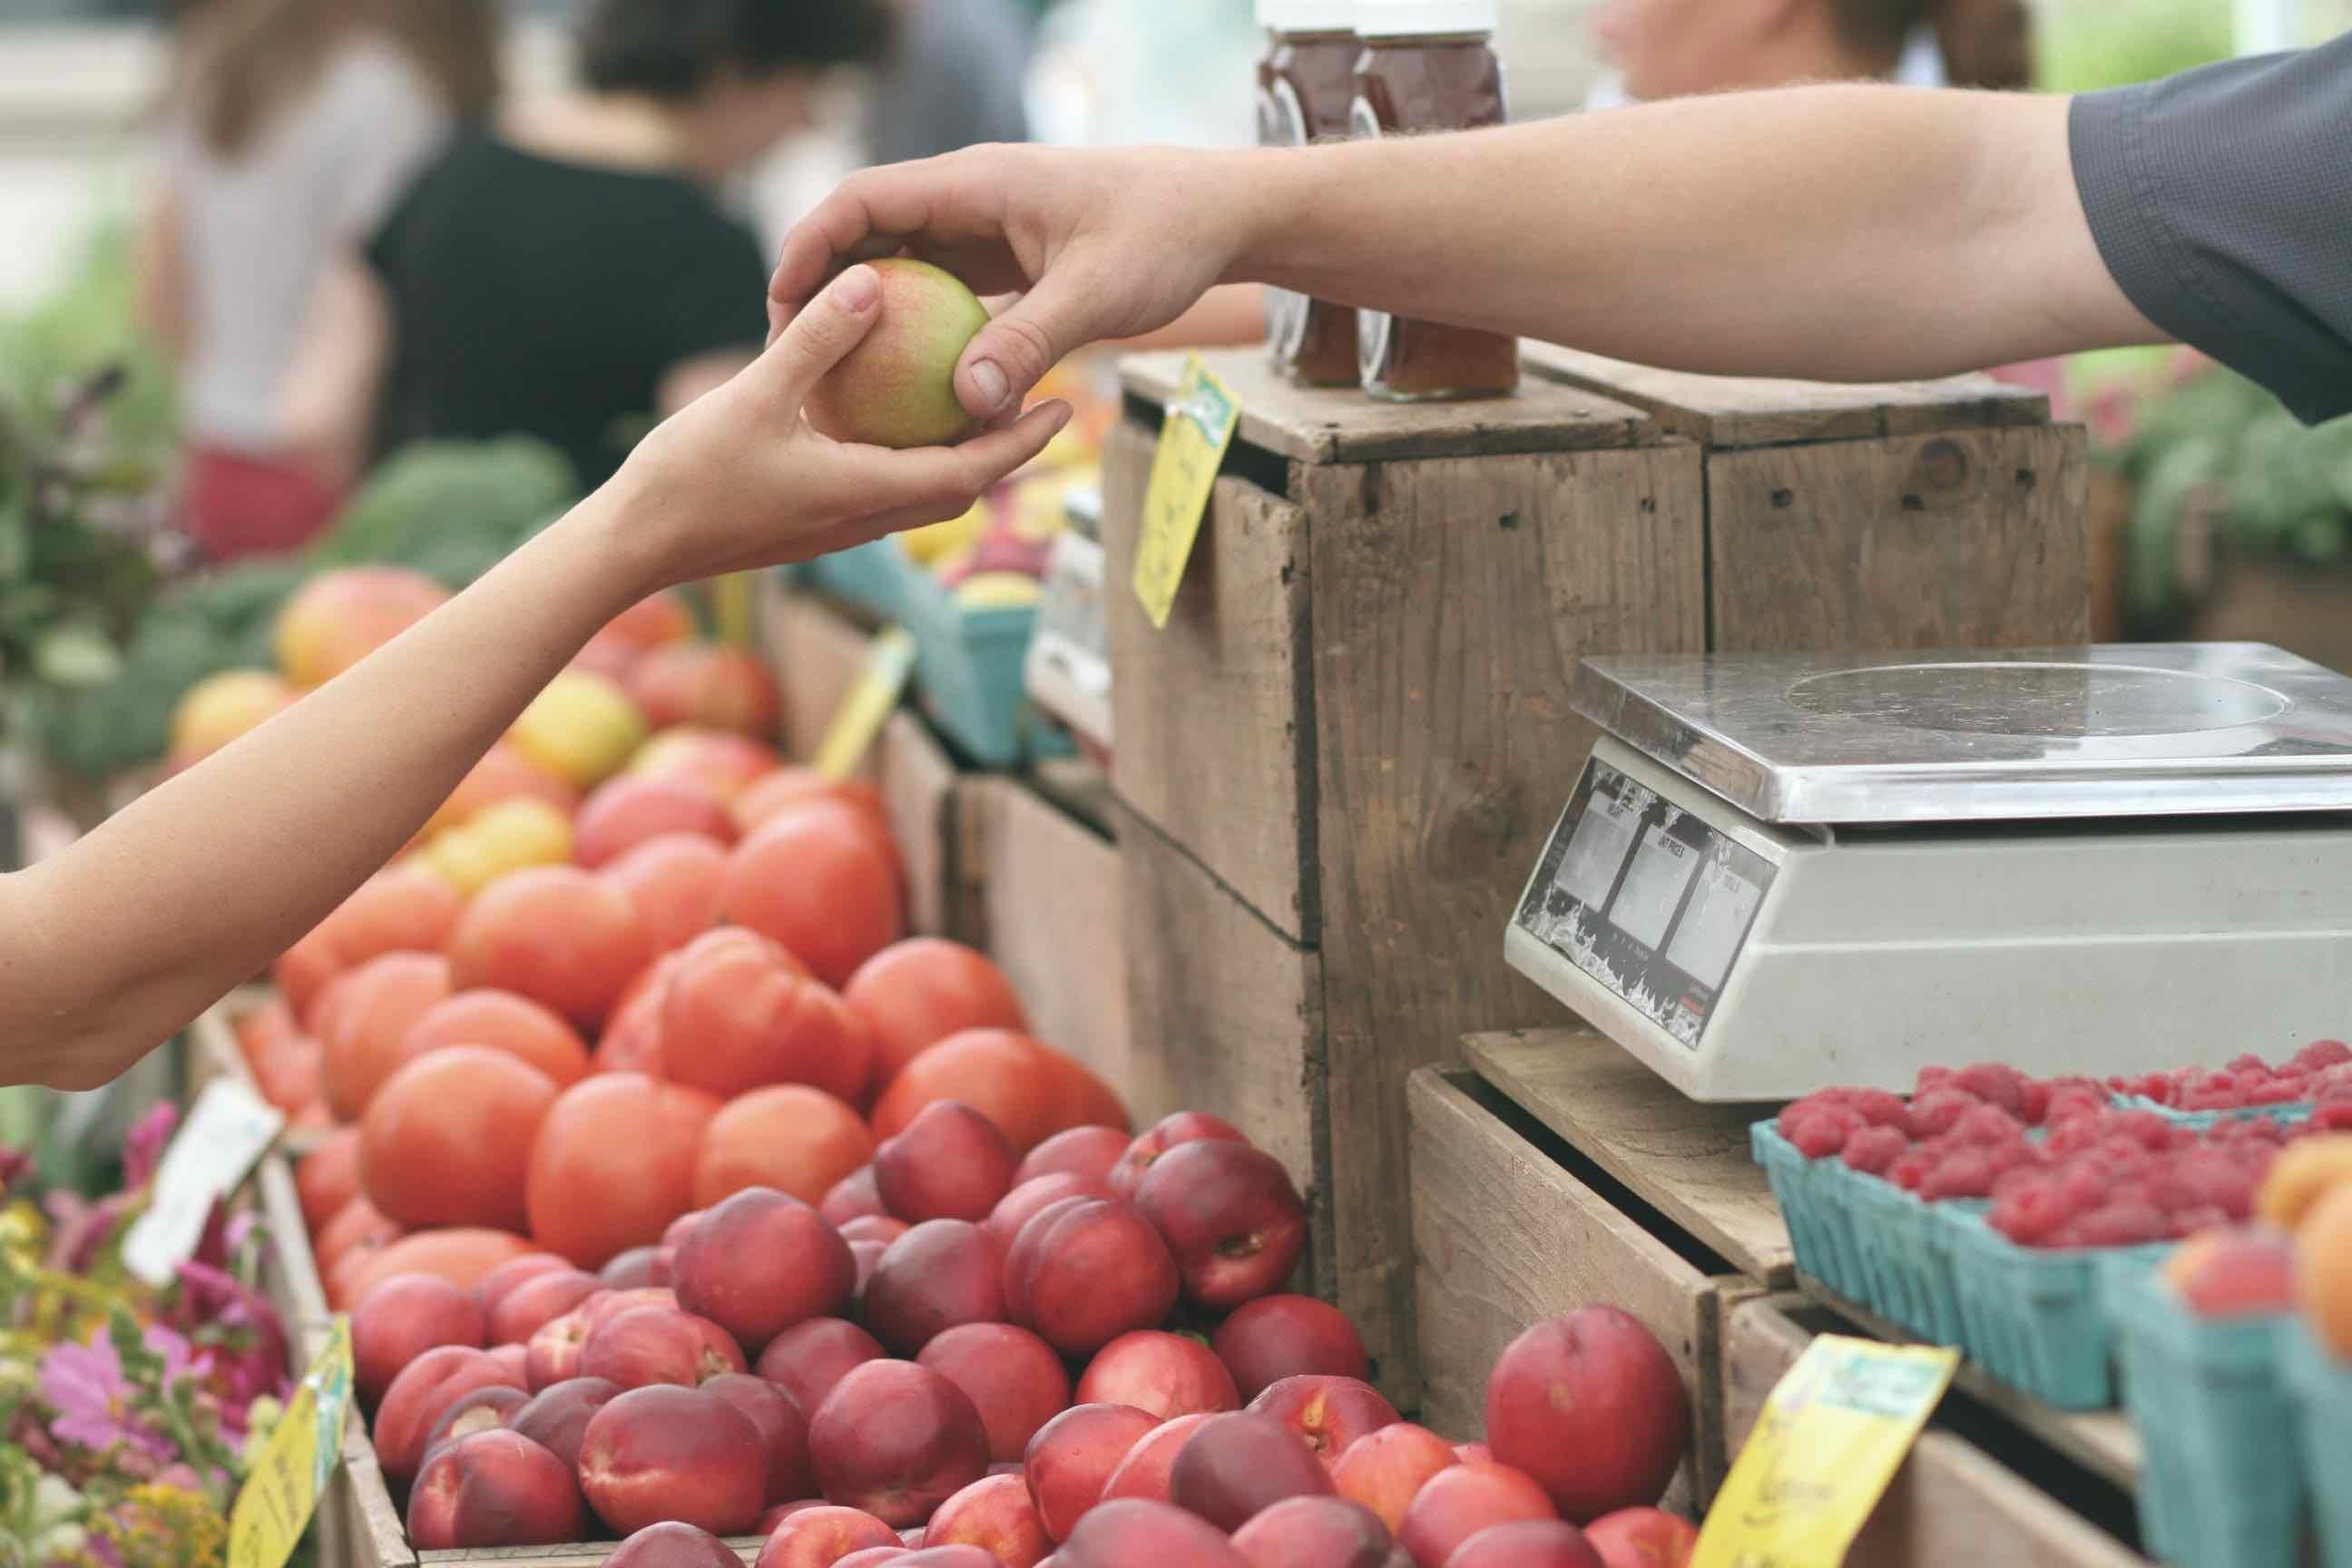 buying fruit at a market